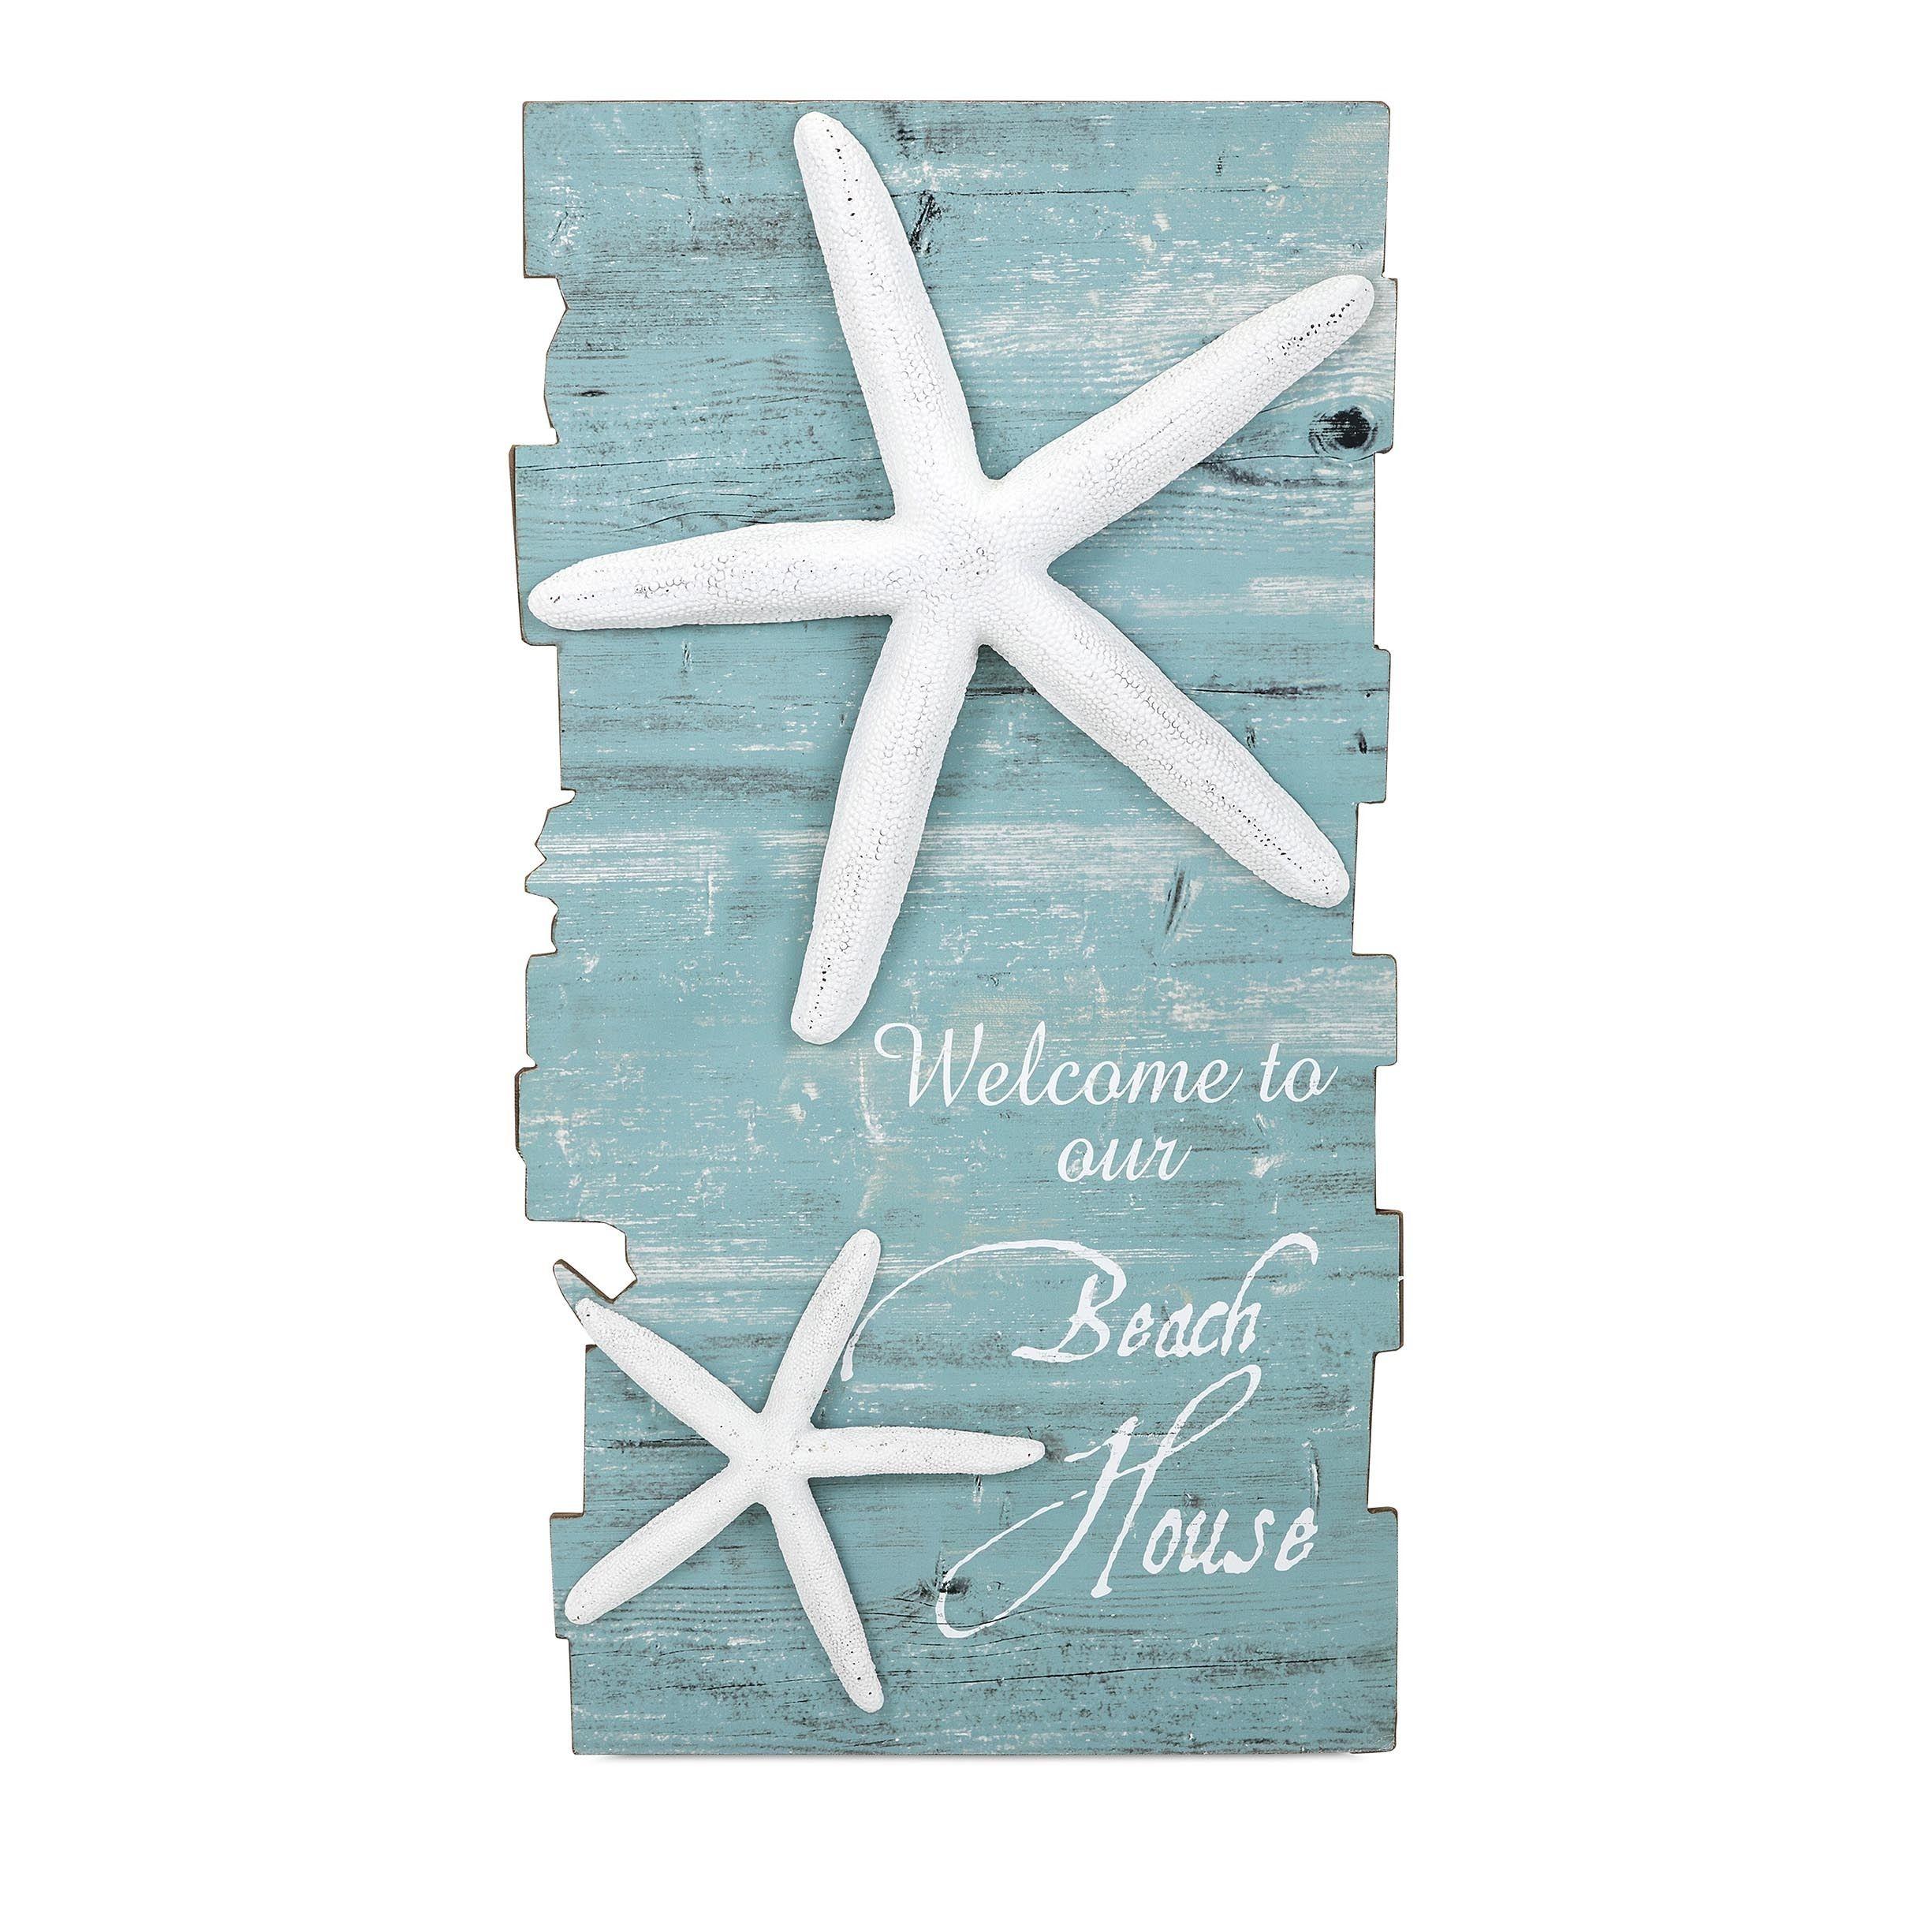 Imax Beach House Starfish Wall Decor Accent Piece Blue Mdf